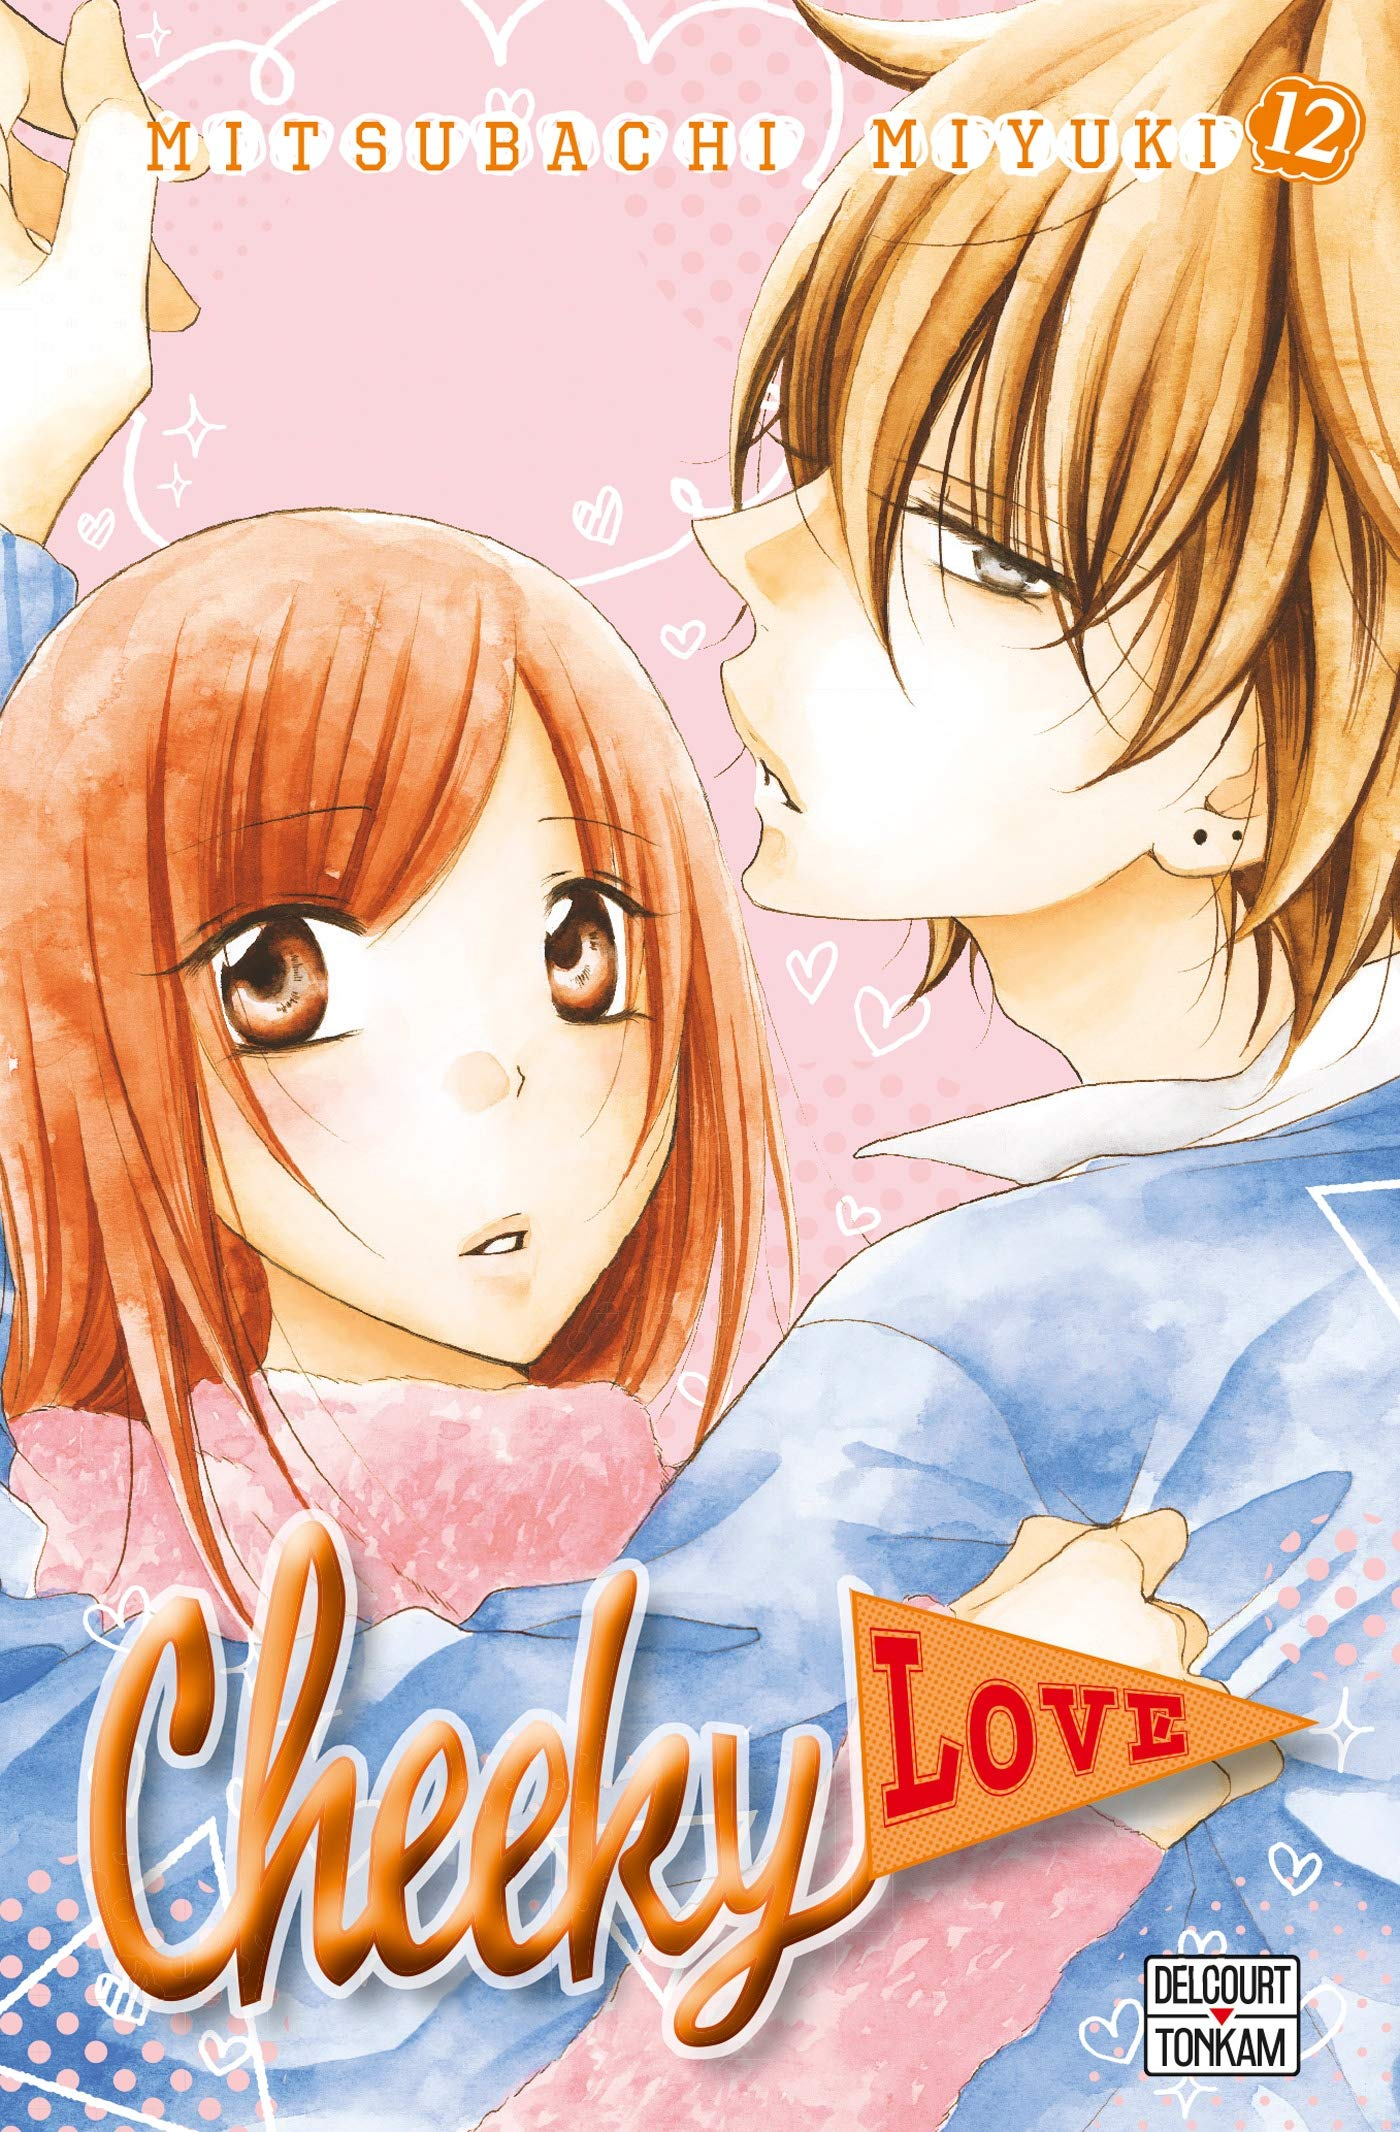 Cheeky love 12